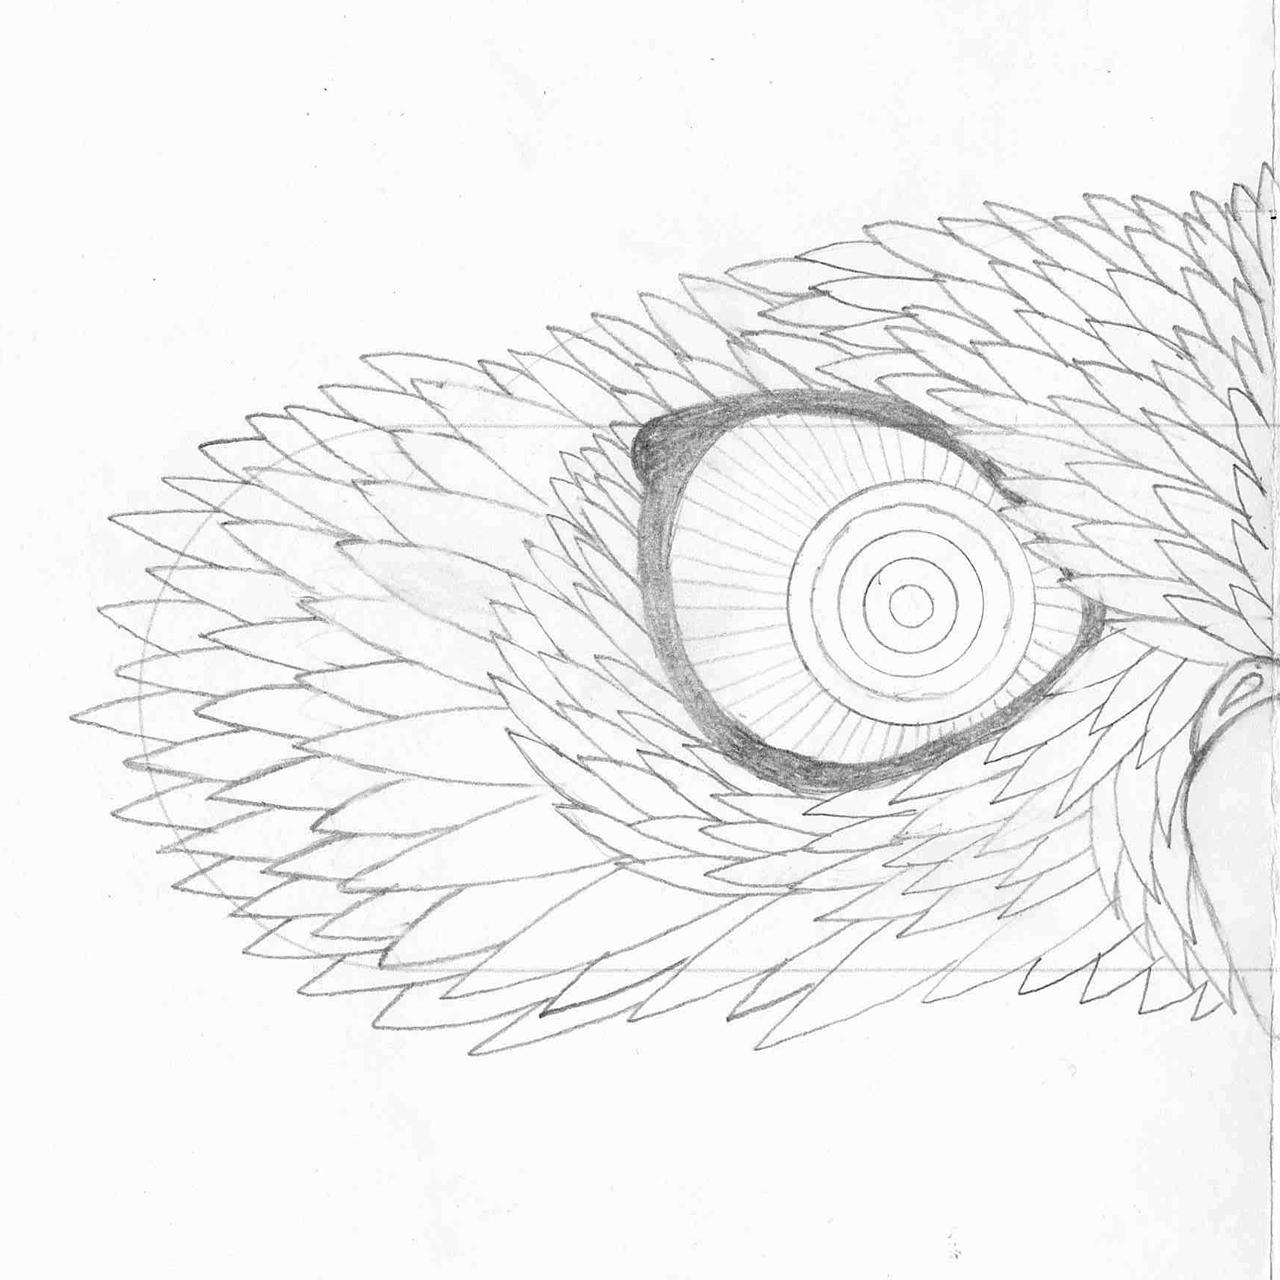 freakart_lv_victorinox_ilustracija_dizains_produkts_05